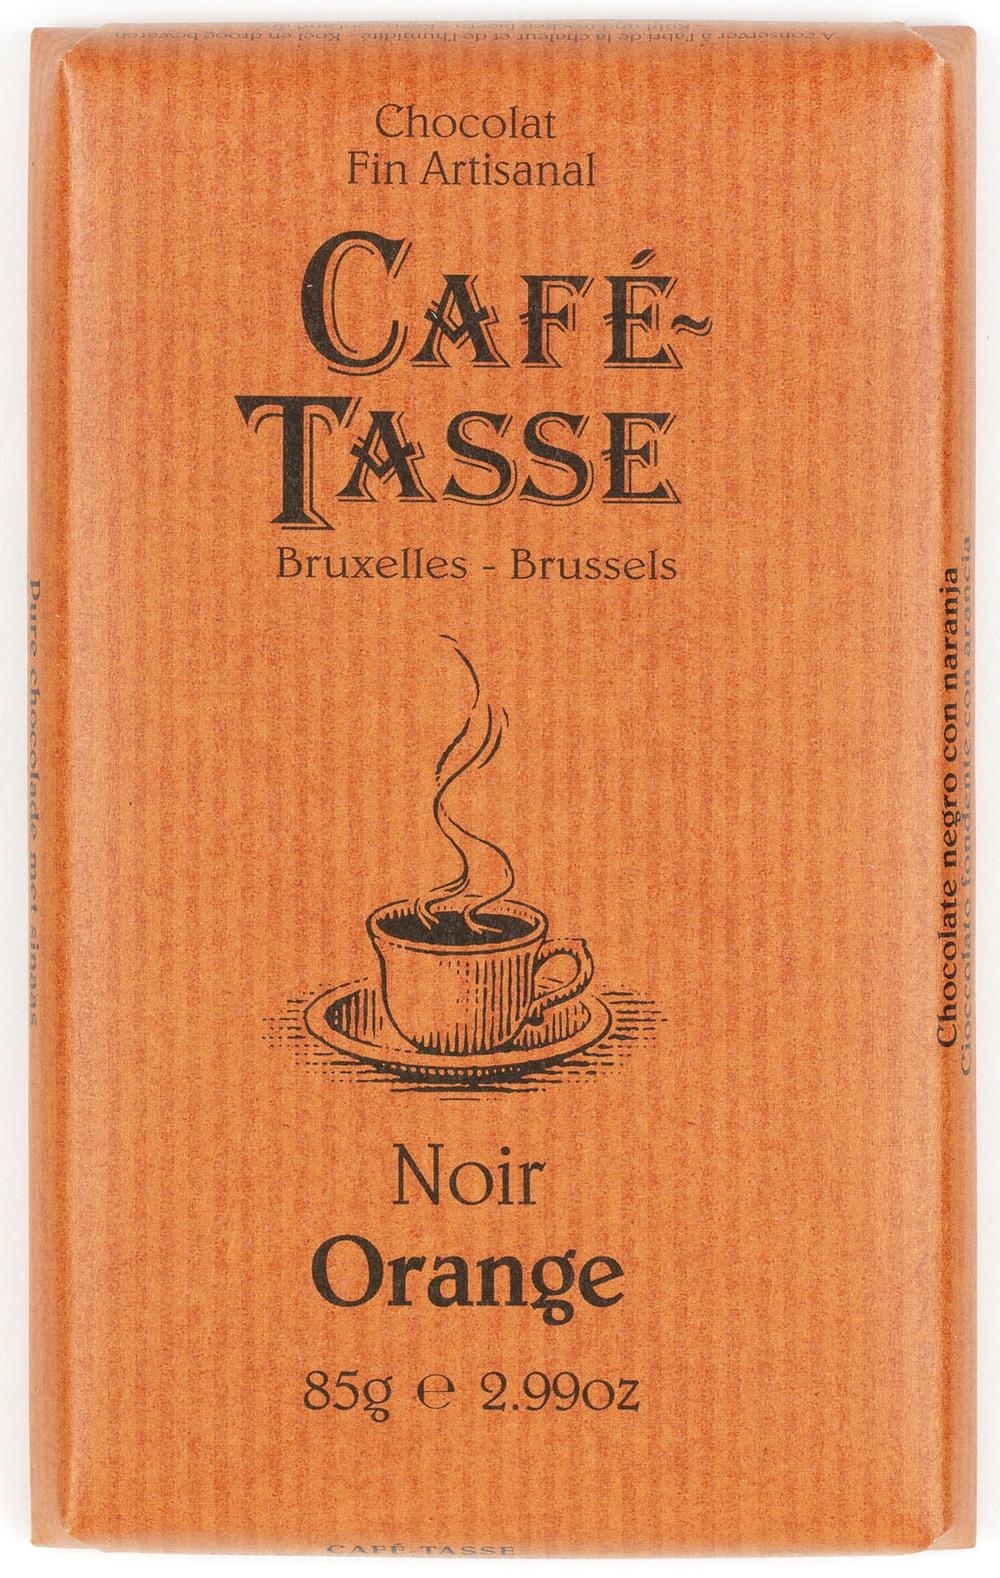 NOIR & ORANGE / DARK & ORANGE TABLETTES / BARS 57% 85G